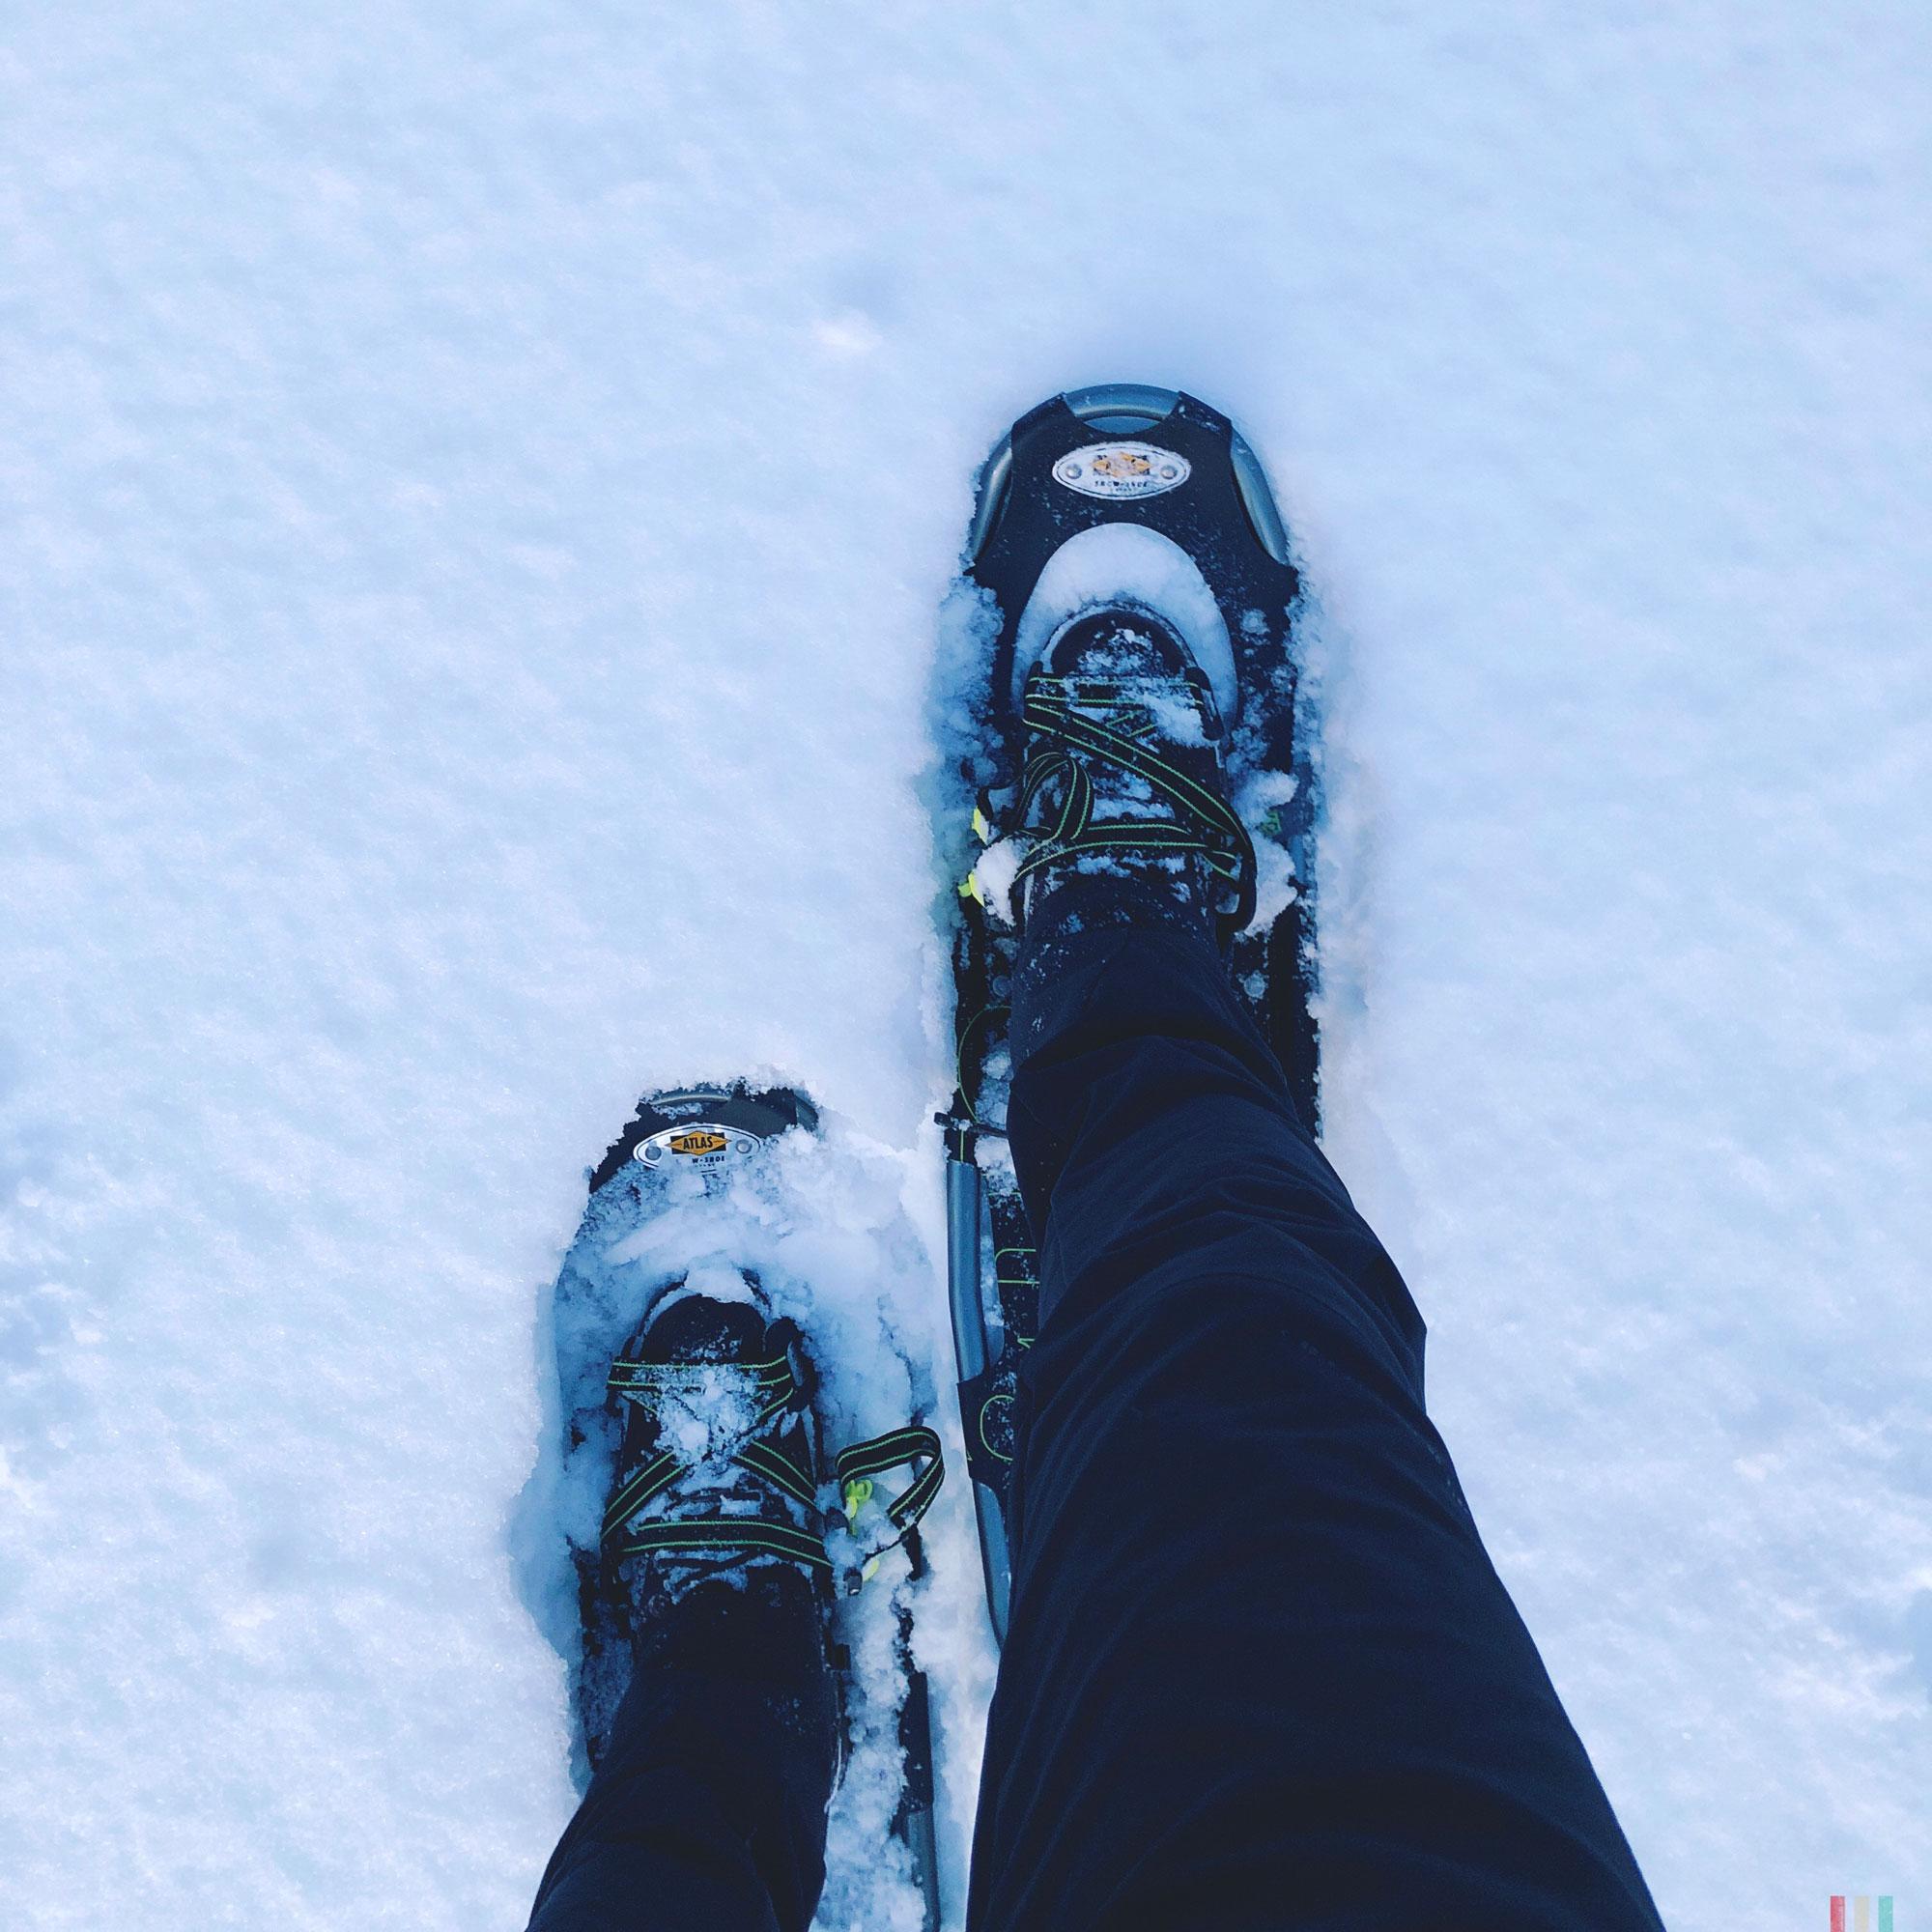 norwegen-senja-wandern-schneeschuhe.jpg